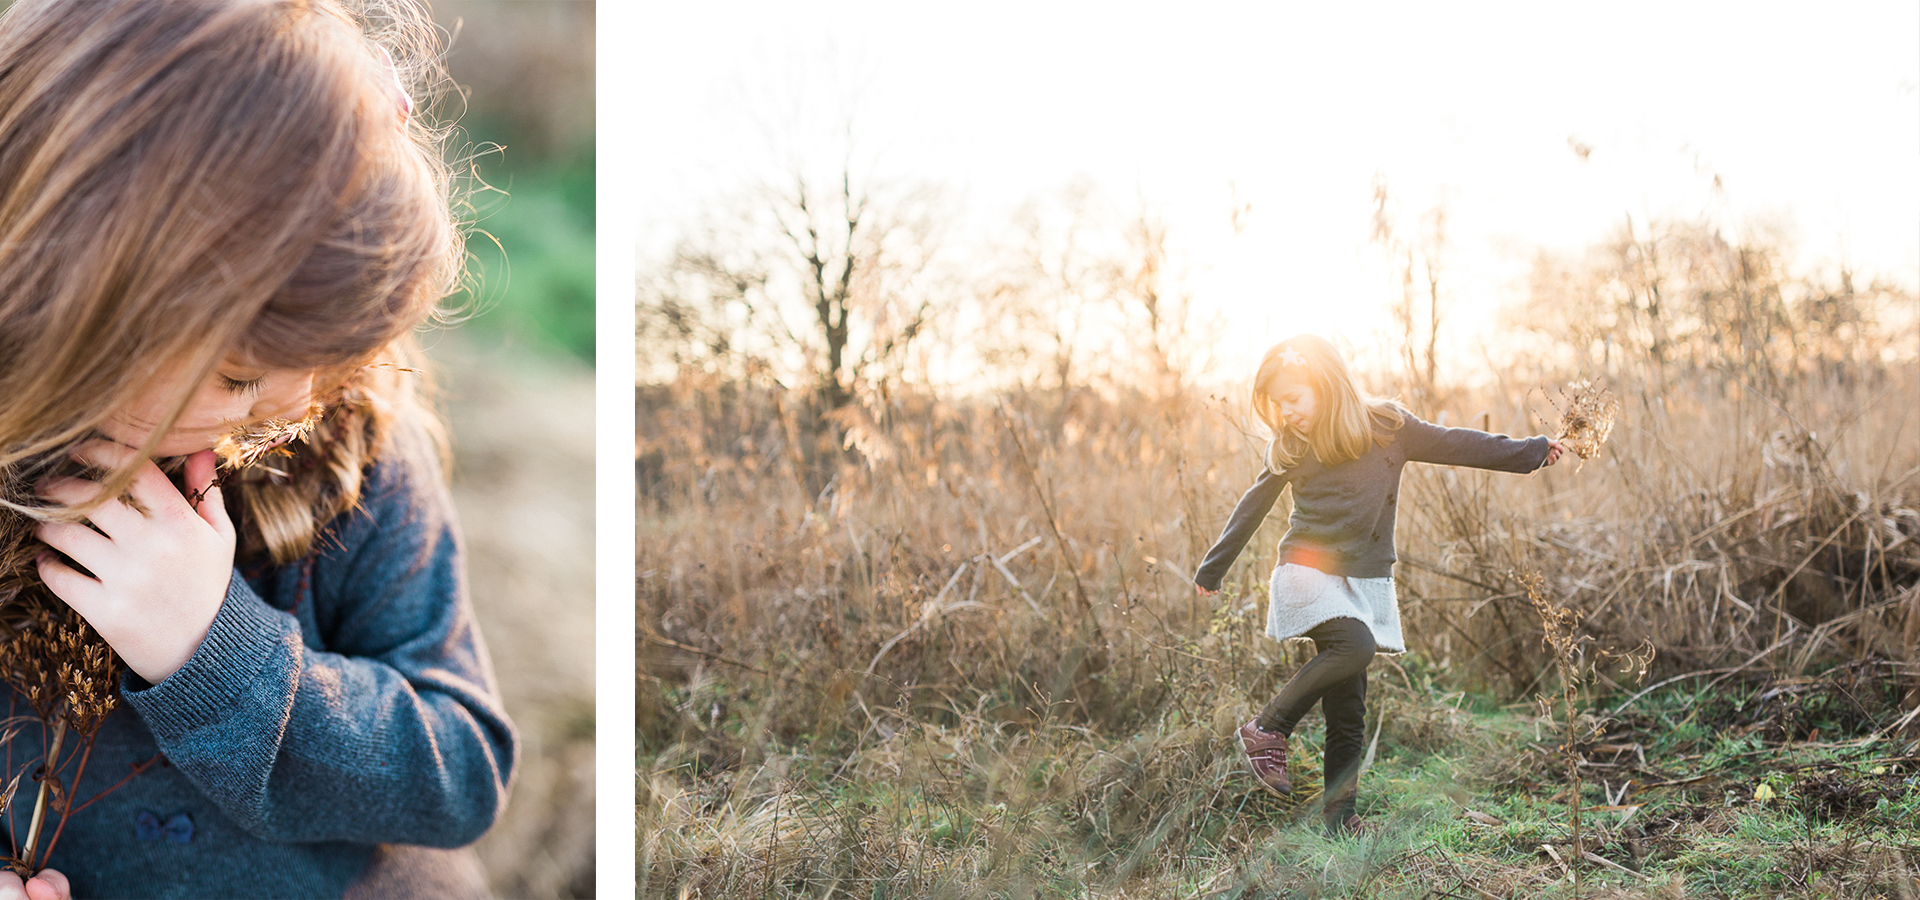 Lifestyleshooting-Familienfotografie-2015-Inka Englisch Photography-Kassel-TB_slider